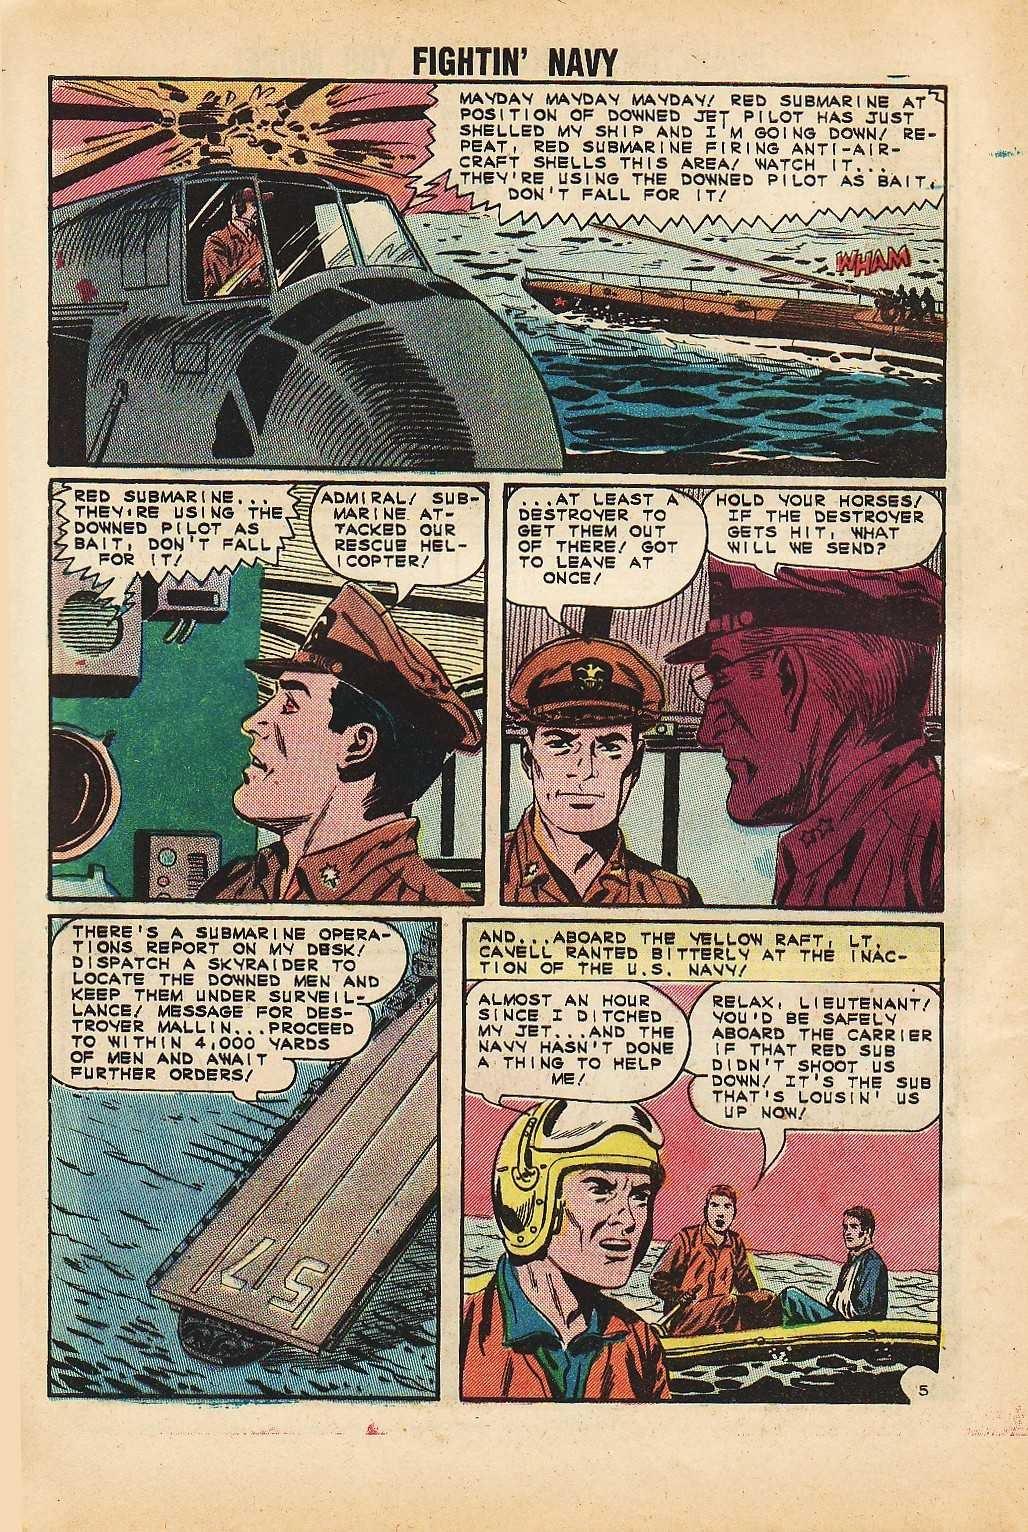 Read online Fightin' Navy comic -  Issue #116 - 8